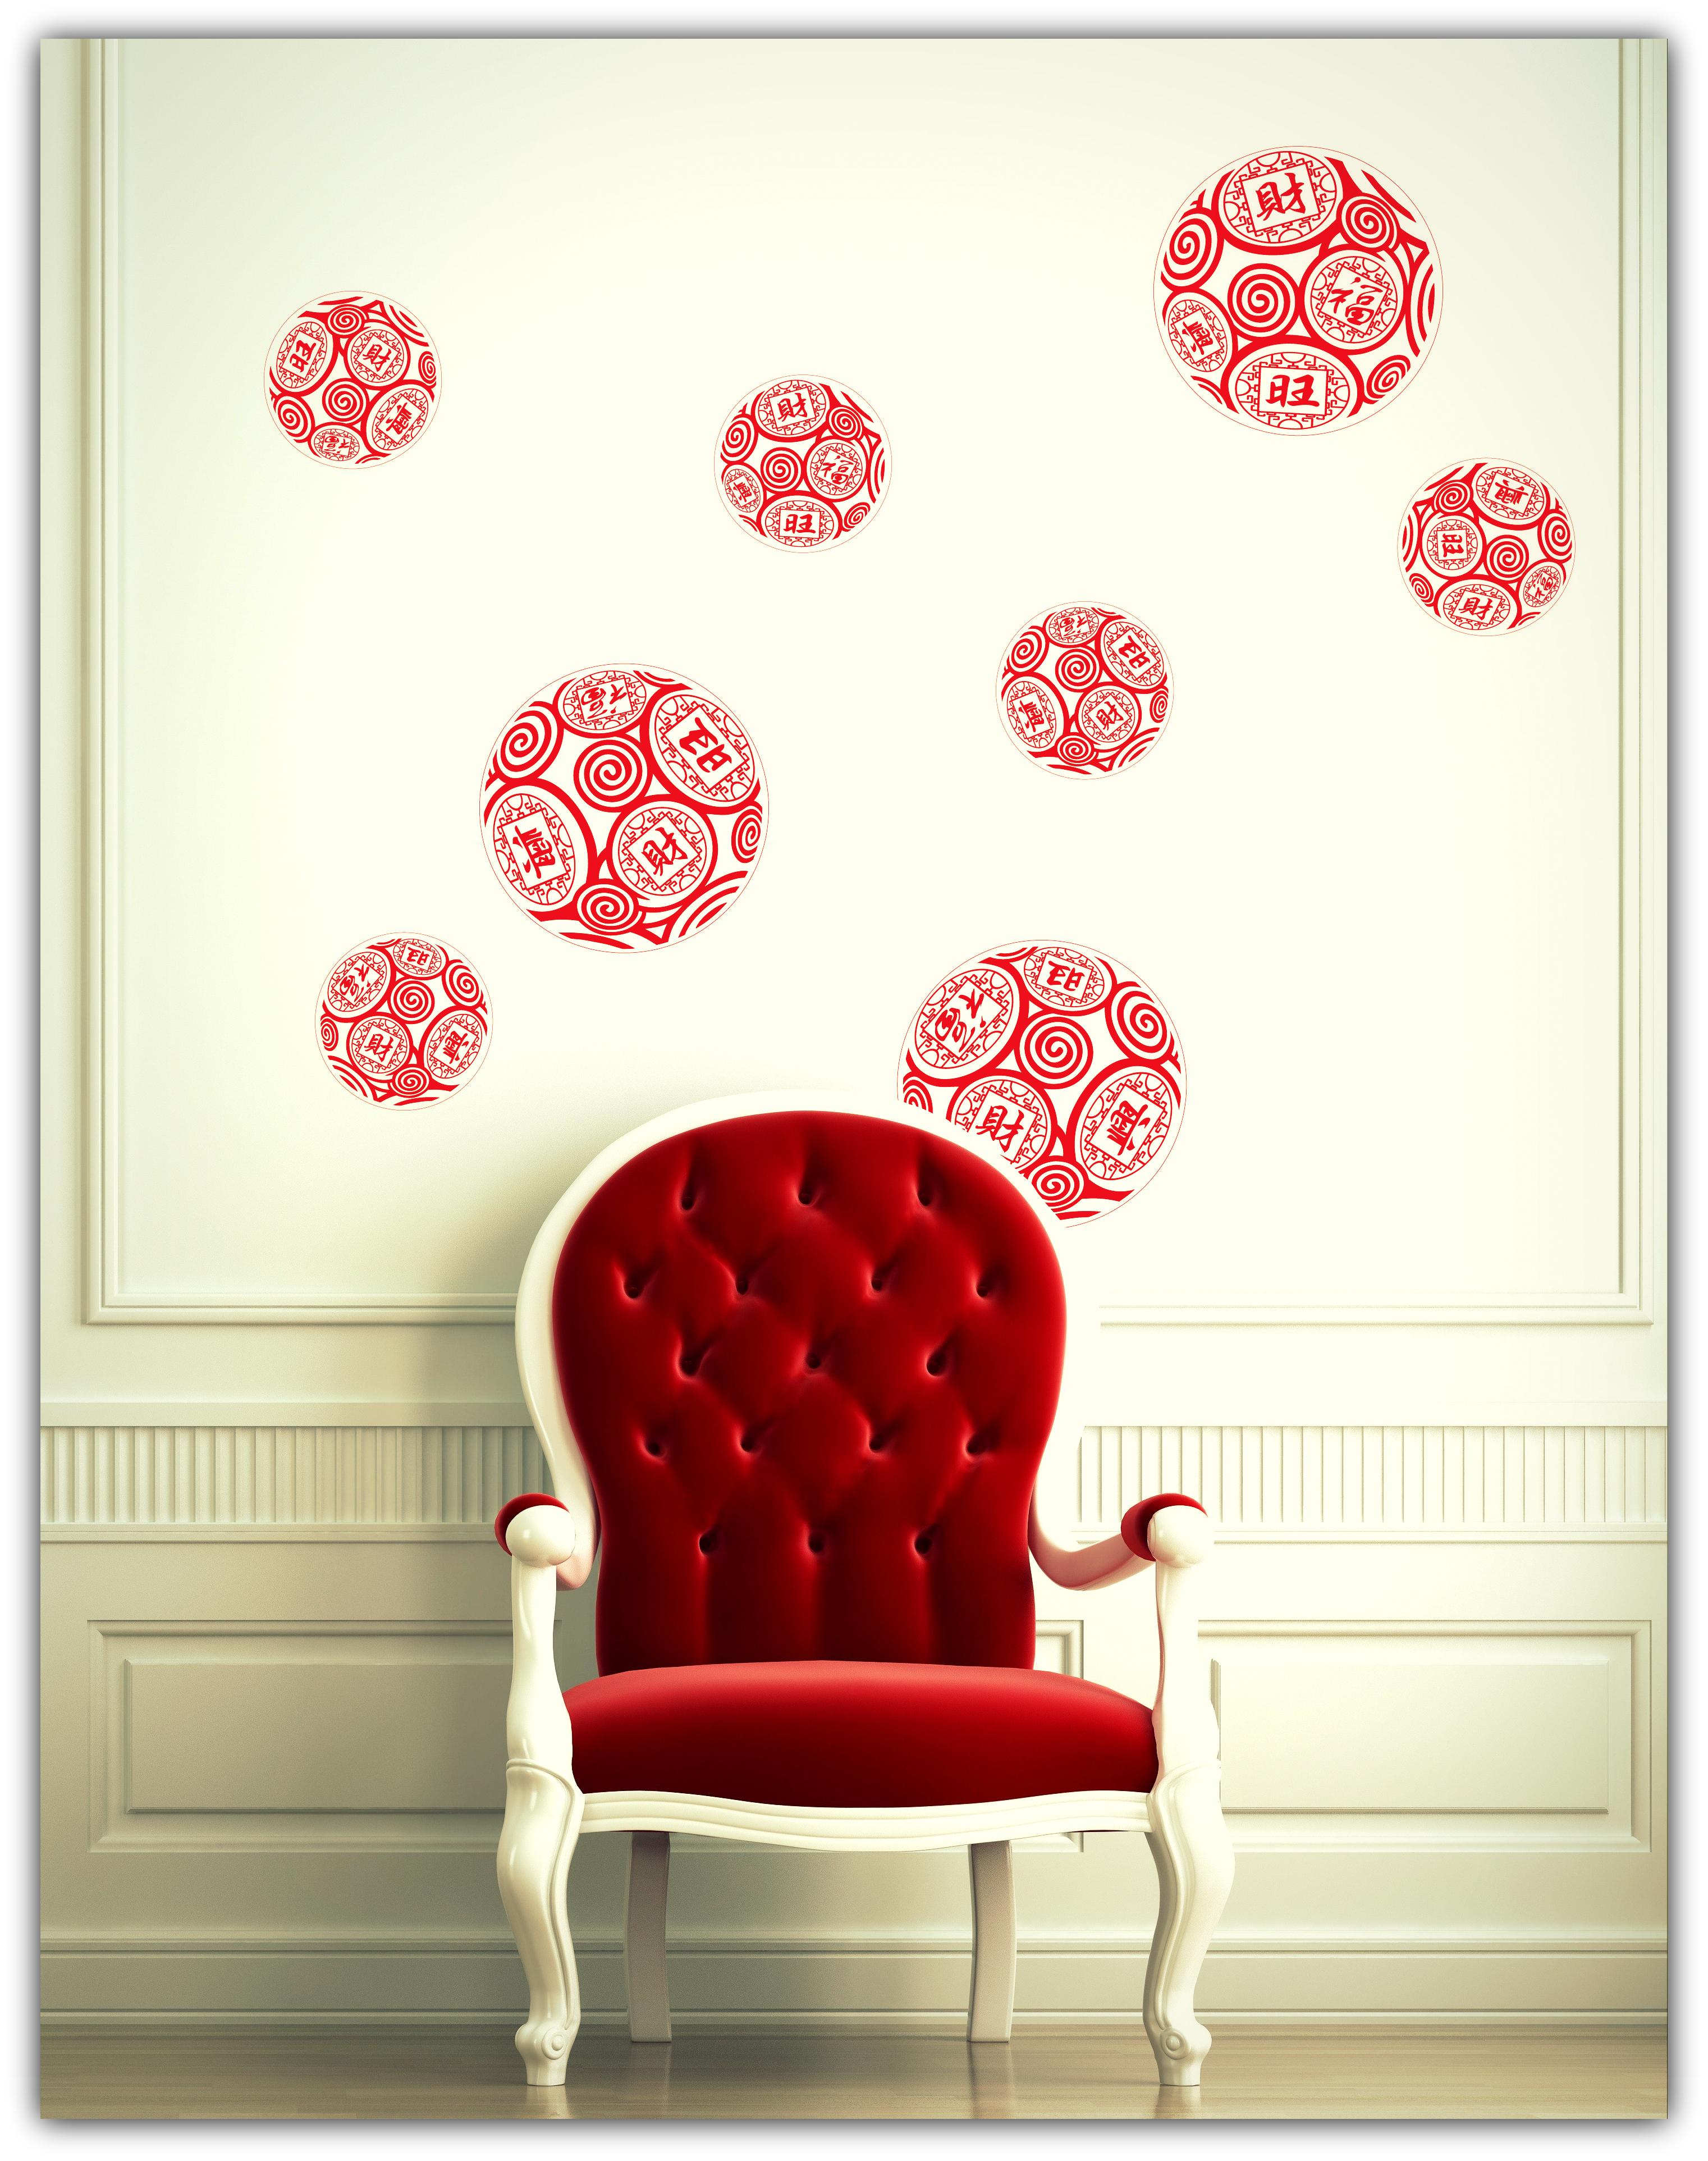 Kitchen Tile Decals Stickers Ez Decor Ez Decor One Stop Store For Your Instant Decor And